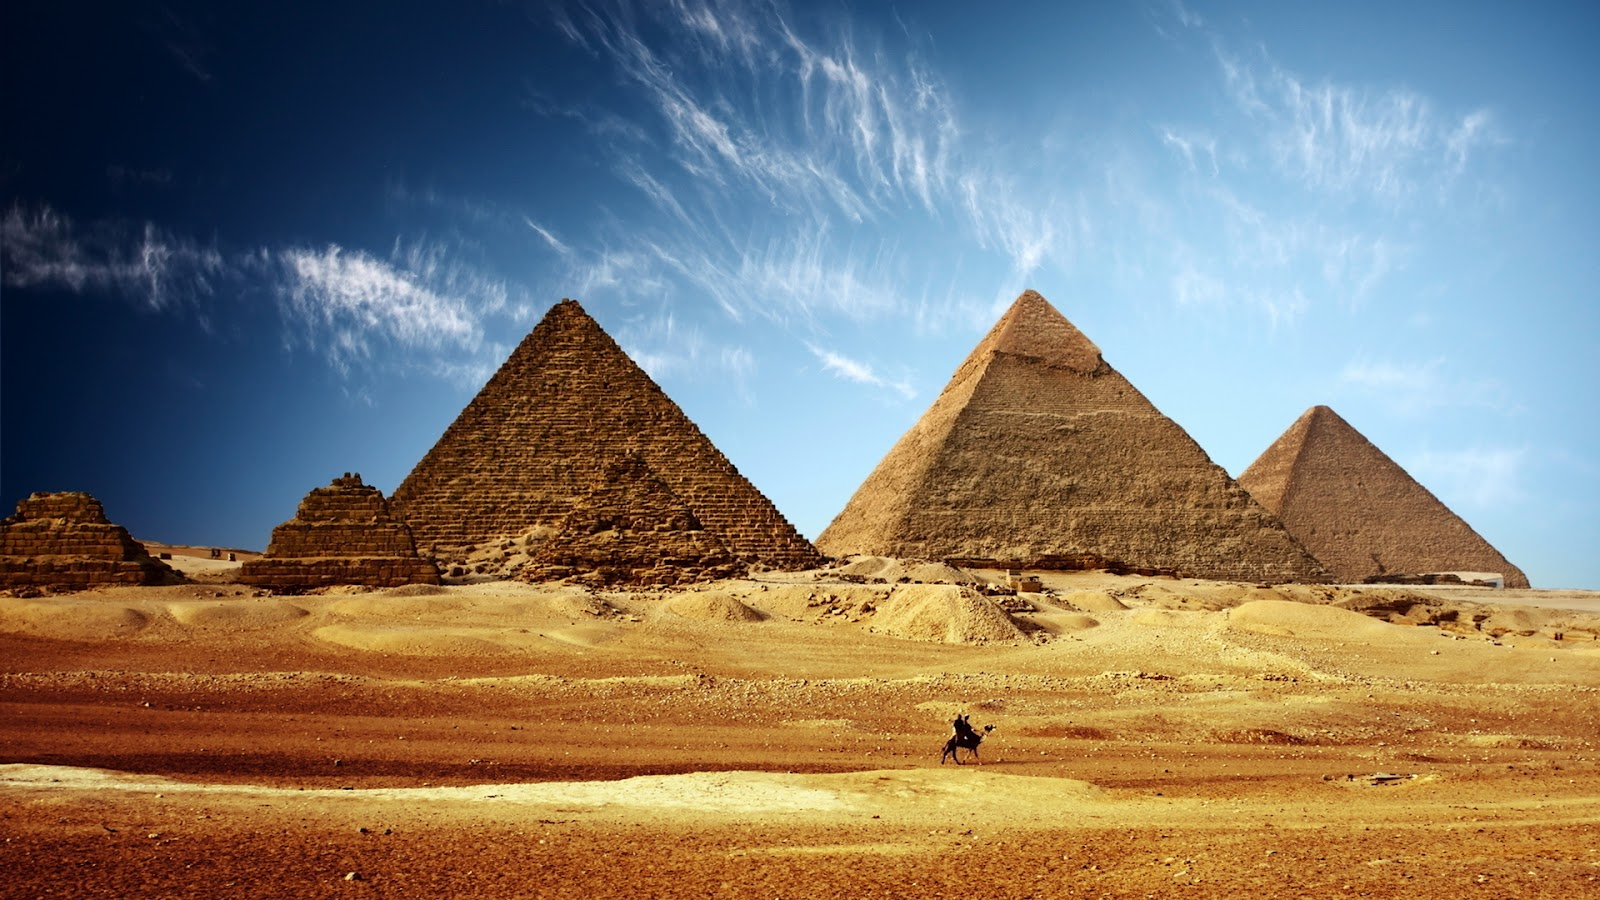 La arquitectura antigua de mesopotamia y egipto ellis for Arquitectura de egipto